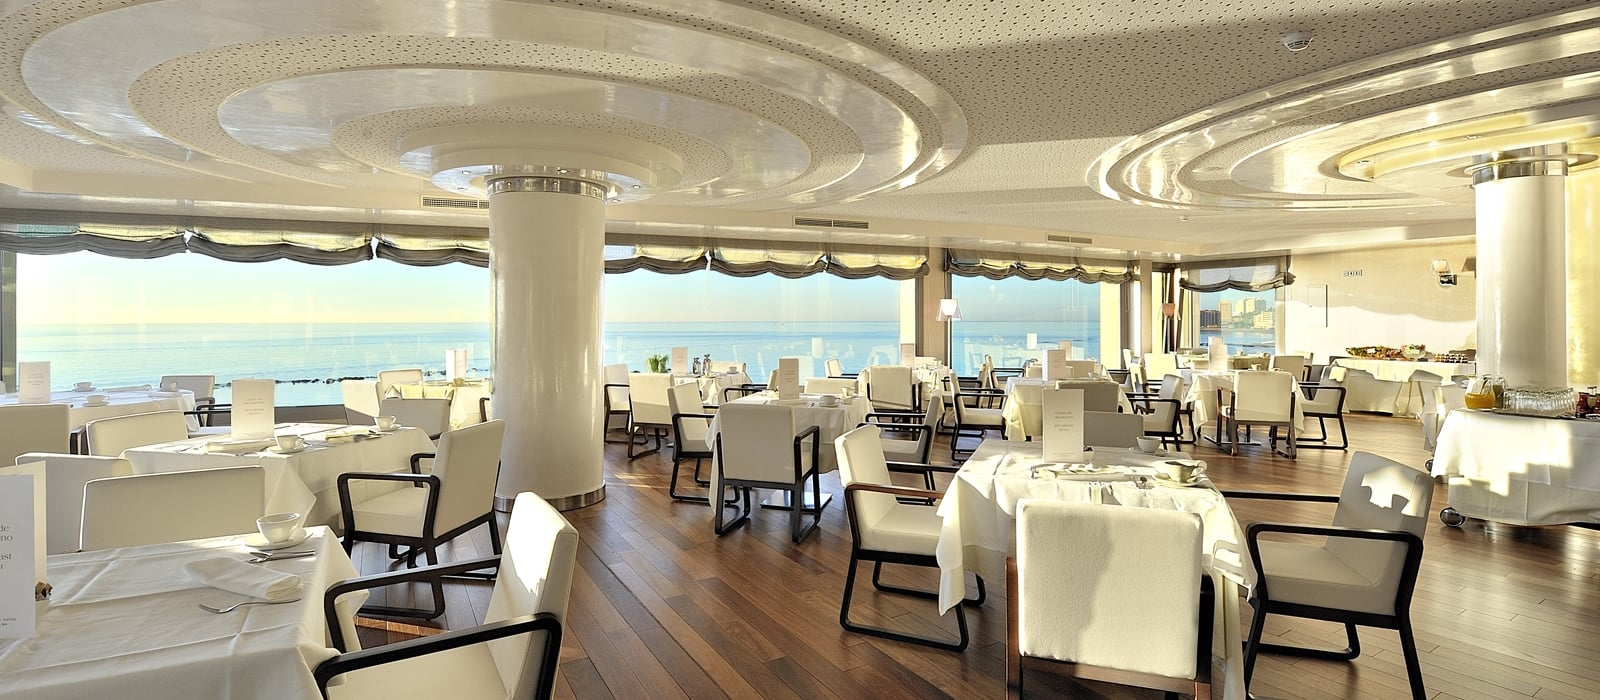 Restaurant h tel aleysa boutique spa vincci hoteles for Bistro hotel